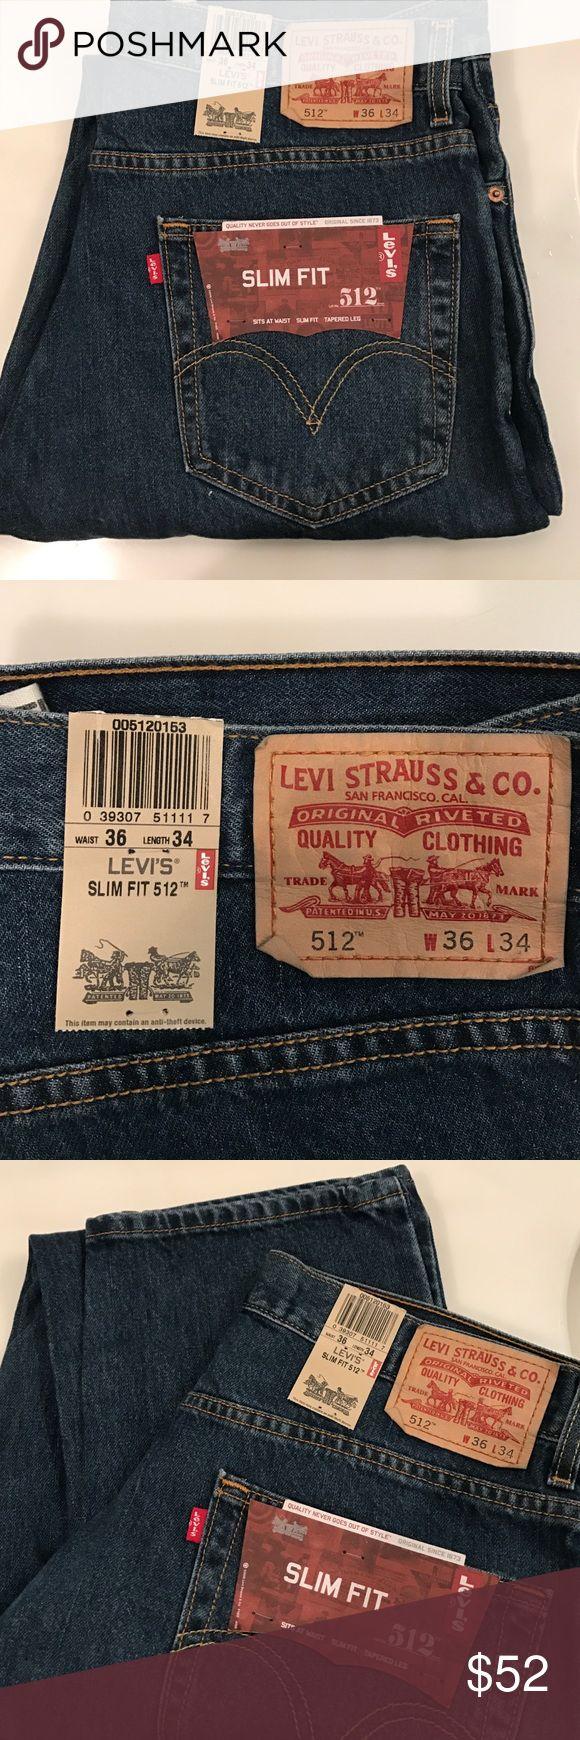 Levi's jeans slim fit tapered Levi's slim fit 512 jeans. 36 x 34. Sits at waist, slim fit, tapered leg. NWT - never worn. Levi's Jeans Slim